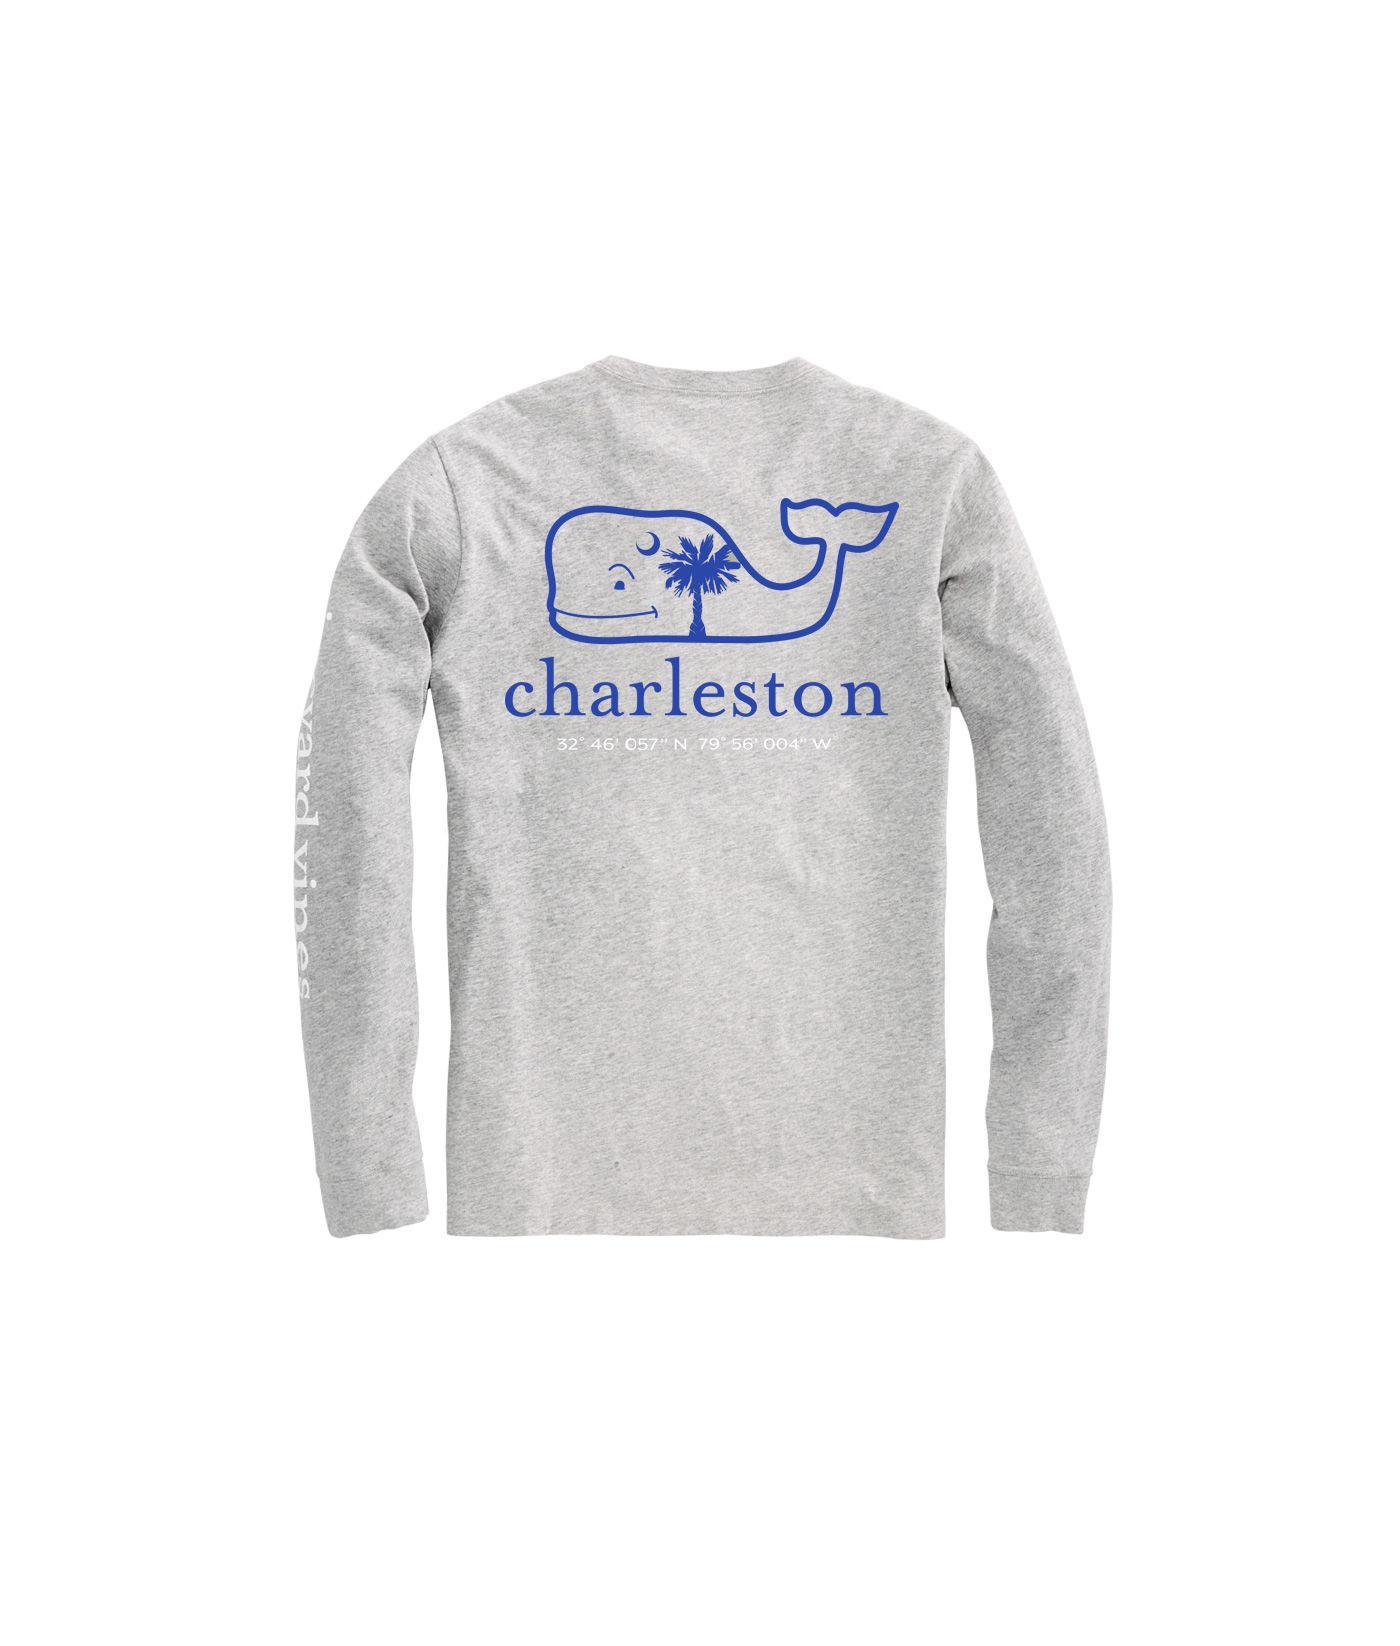 f60611c38e1 Lyst - Vineyard Vines Adult Long-sleeve Charleston Coordinates ...